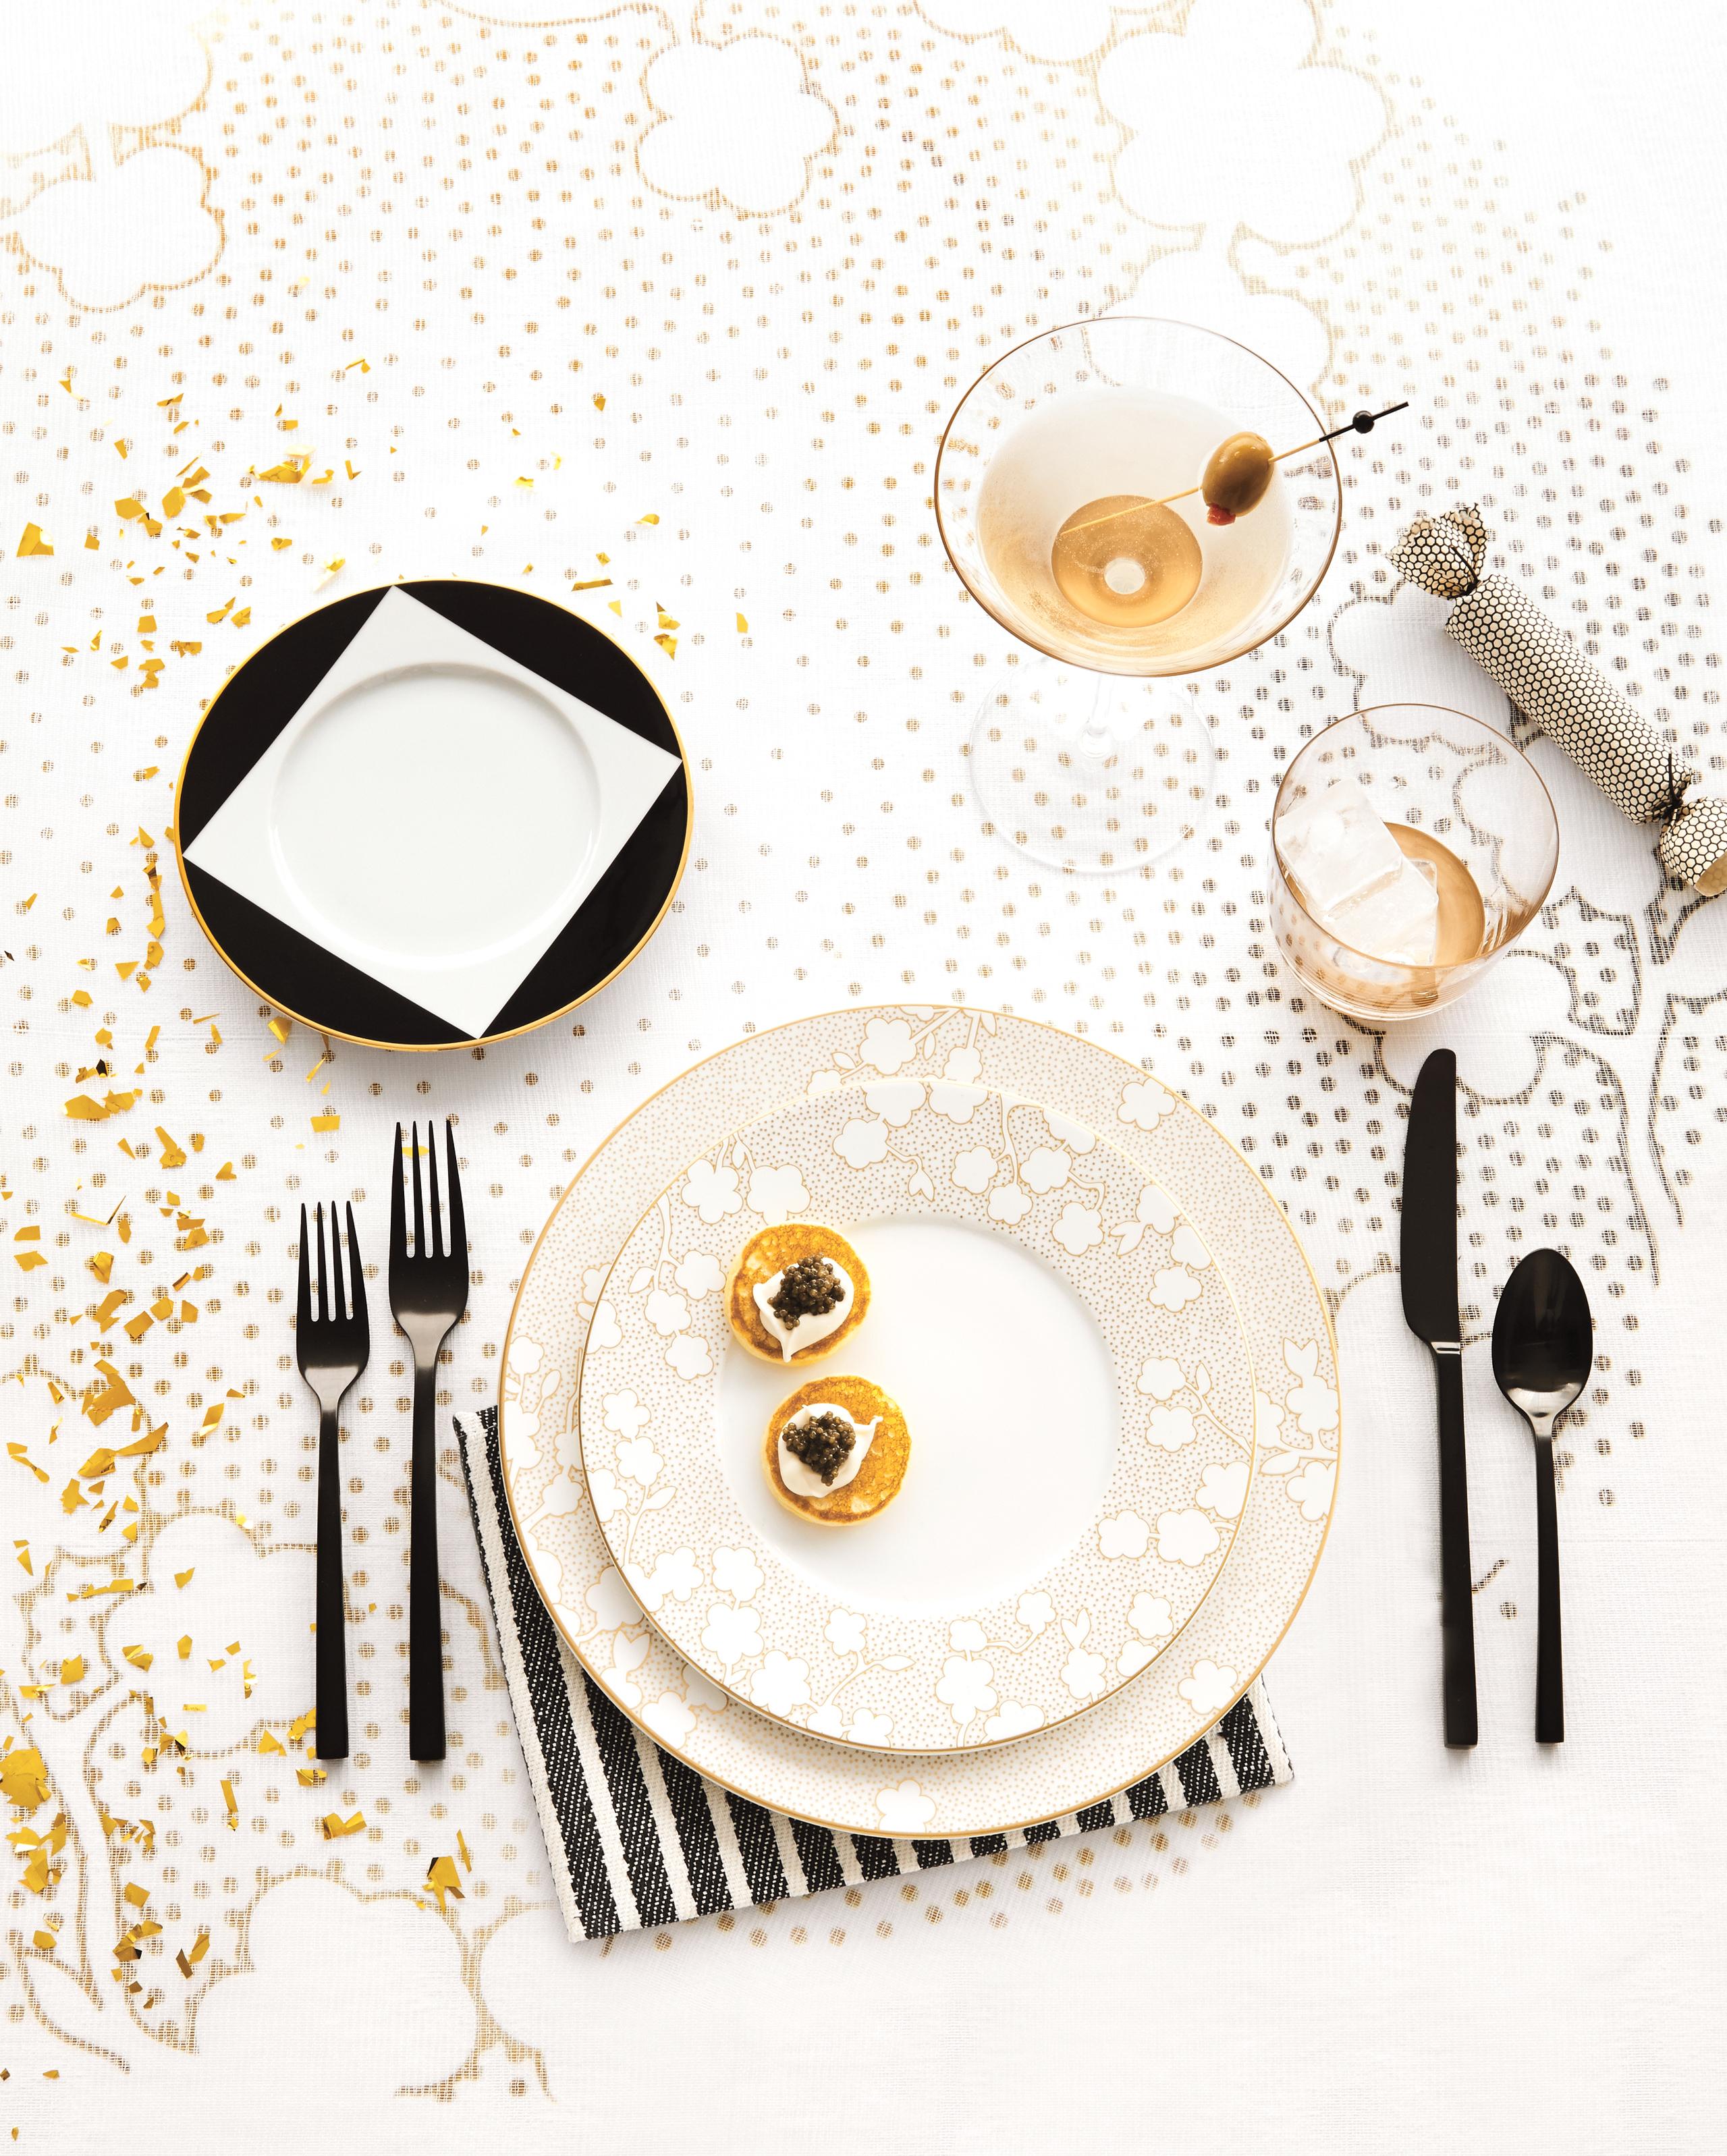 place-setting-celebration-105-d112189-comp.jpg